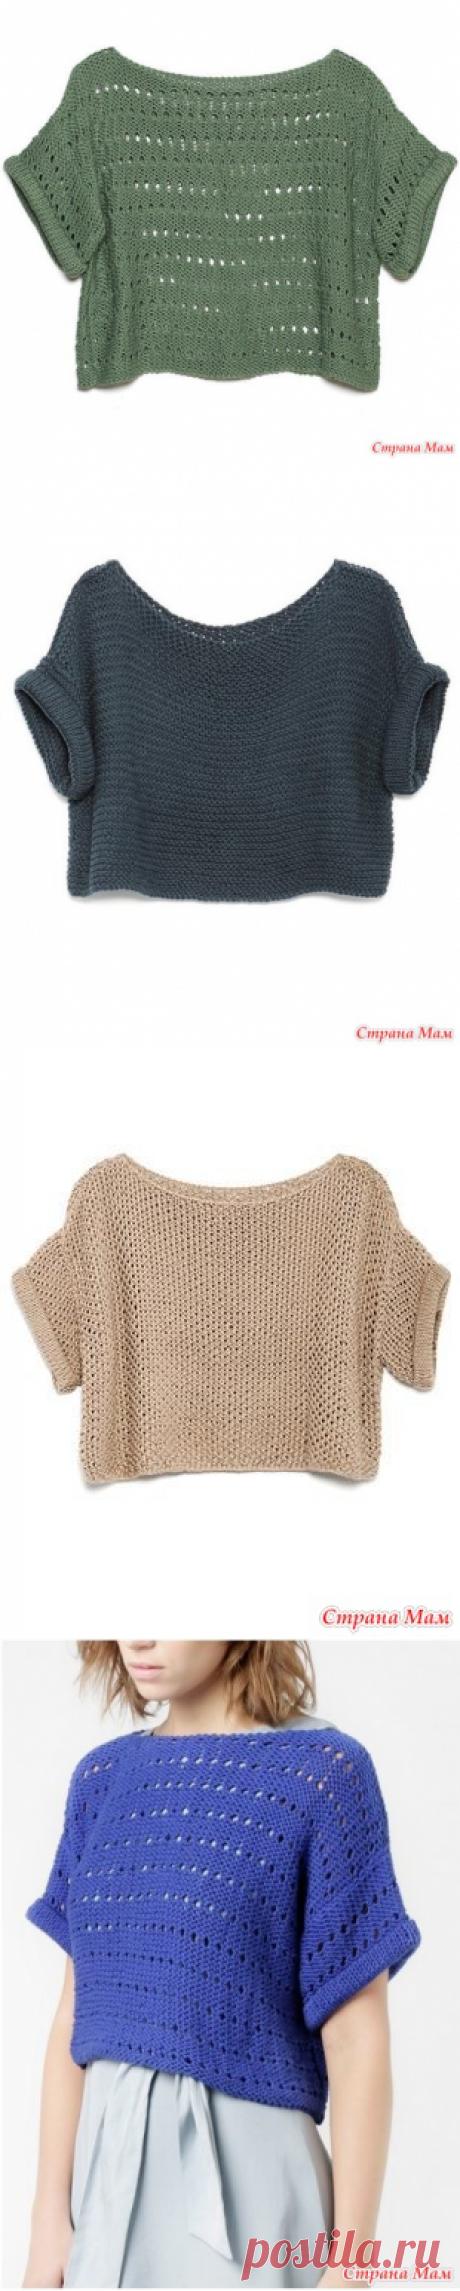 Вяжем вместе короткий свитер DIANA - Вяжем вместе он-лайн - Страна Мам